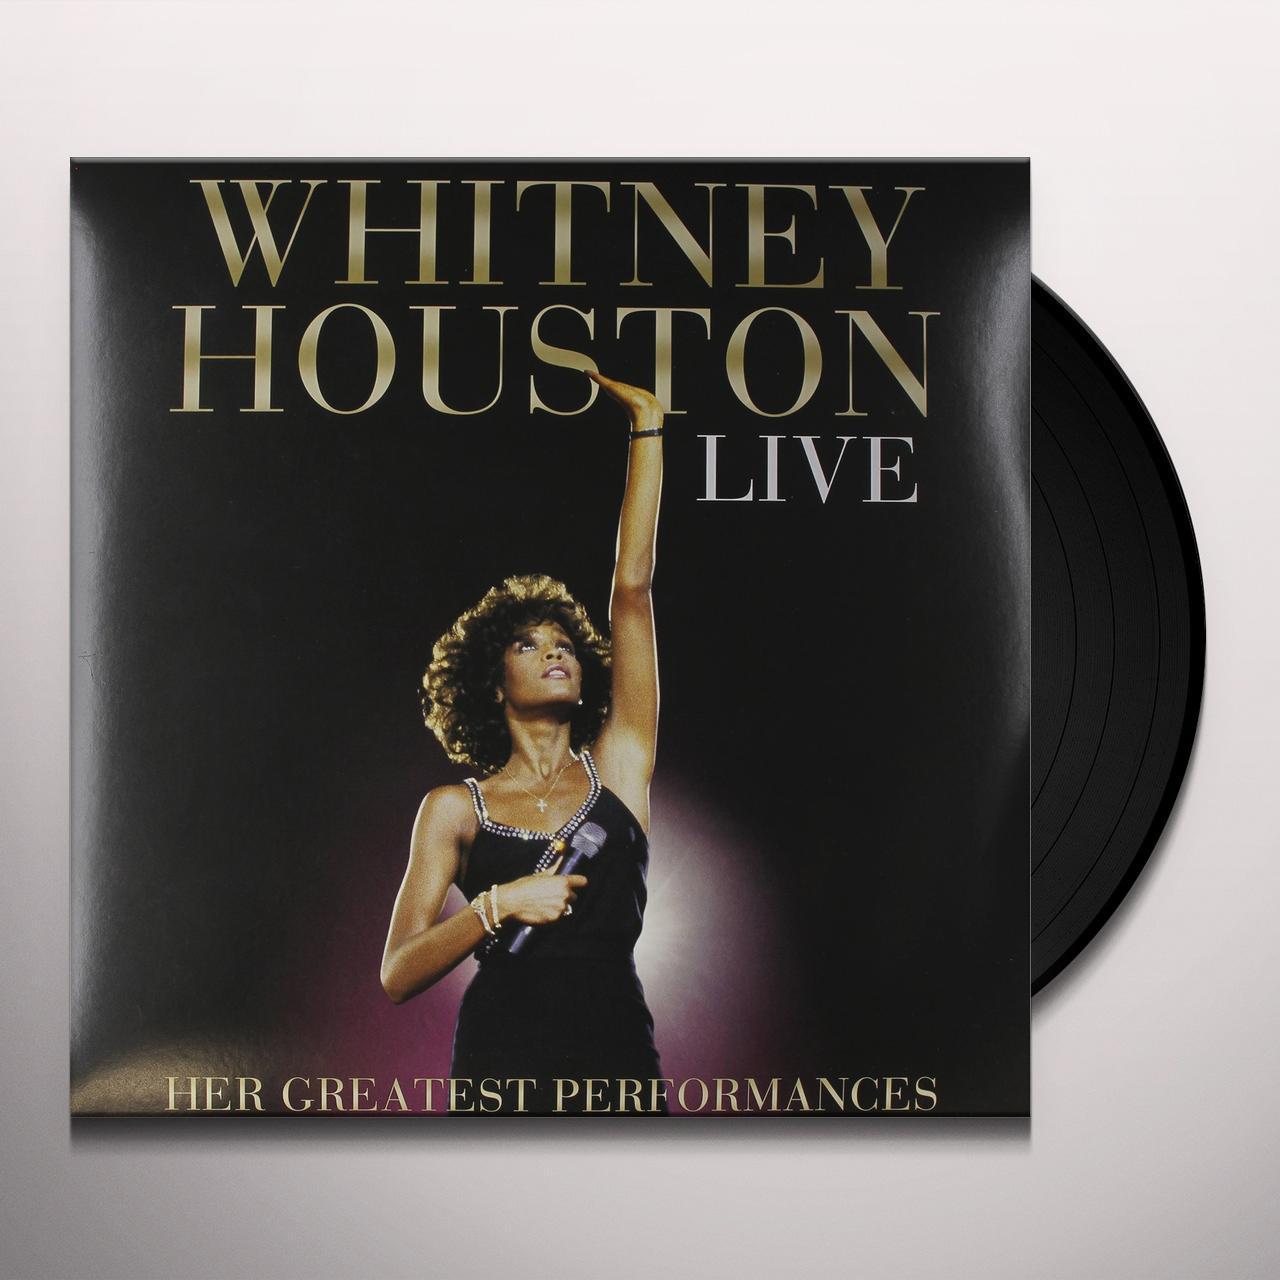 Whitney houston live her greatest performances